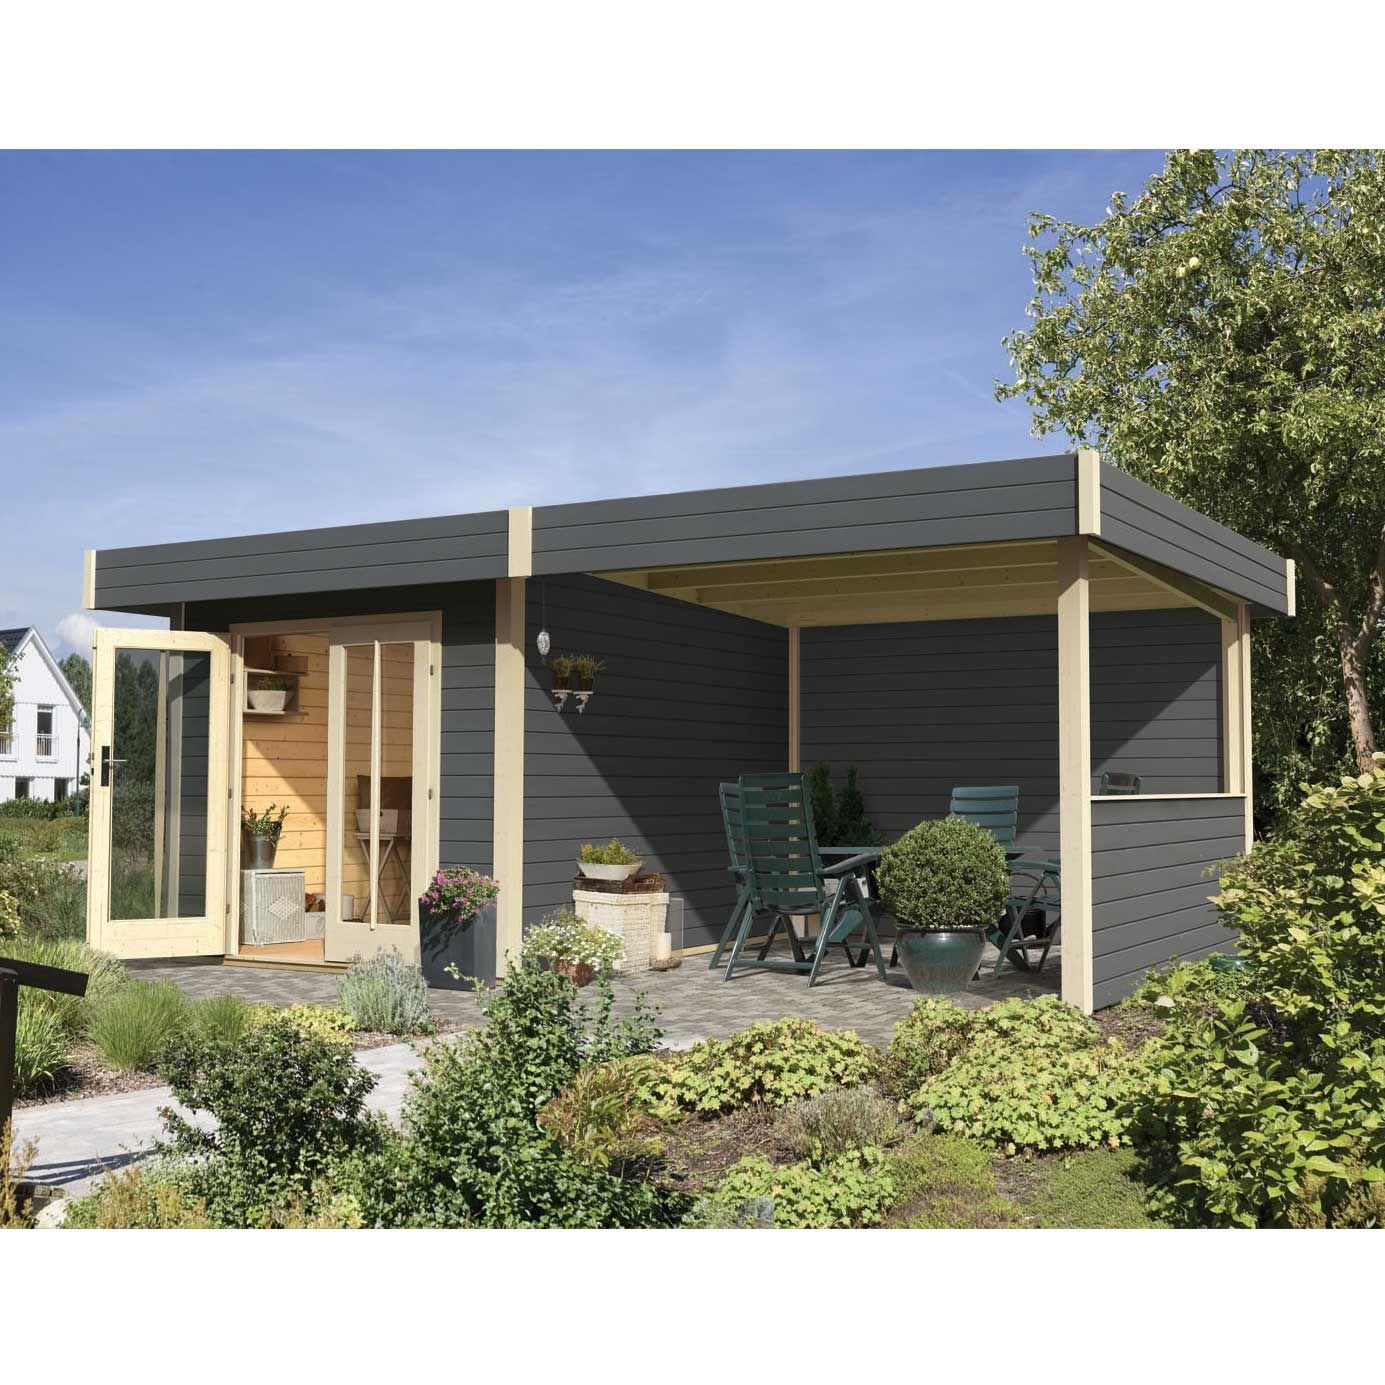 Squared | Abri De Jardin Bois, Abri De Jardin, Aménagement ... pour Abri Jardin Design